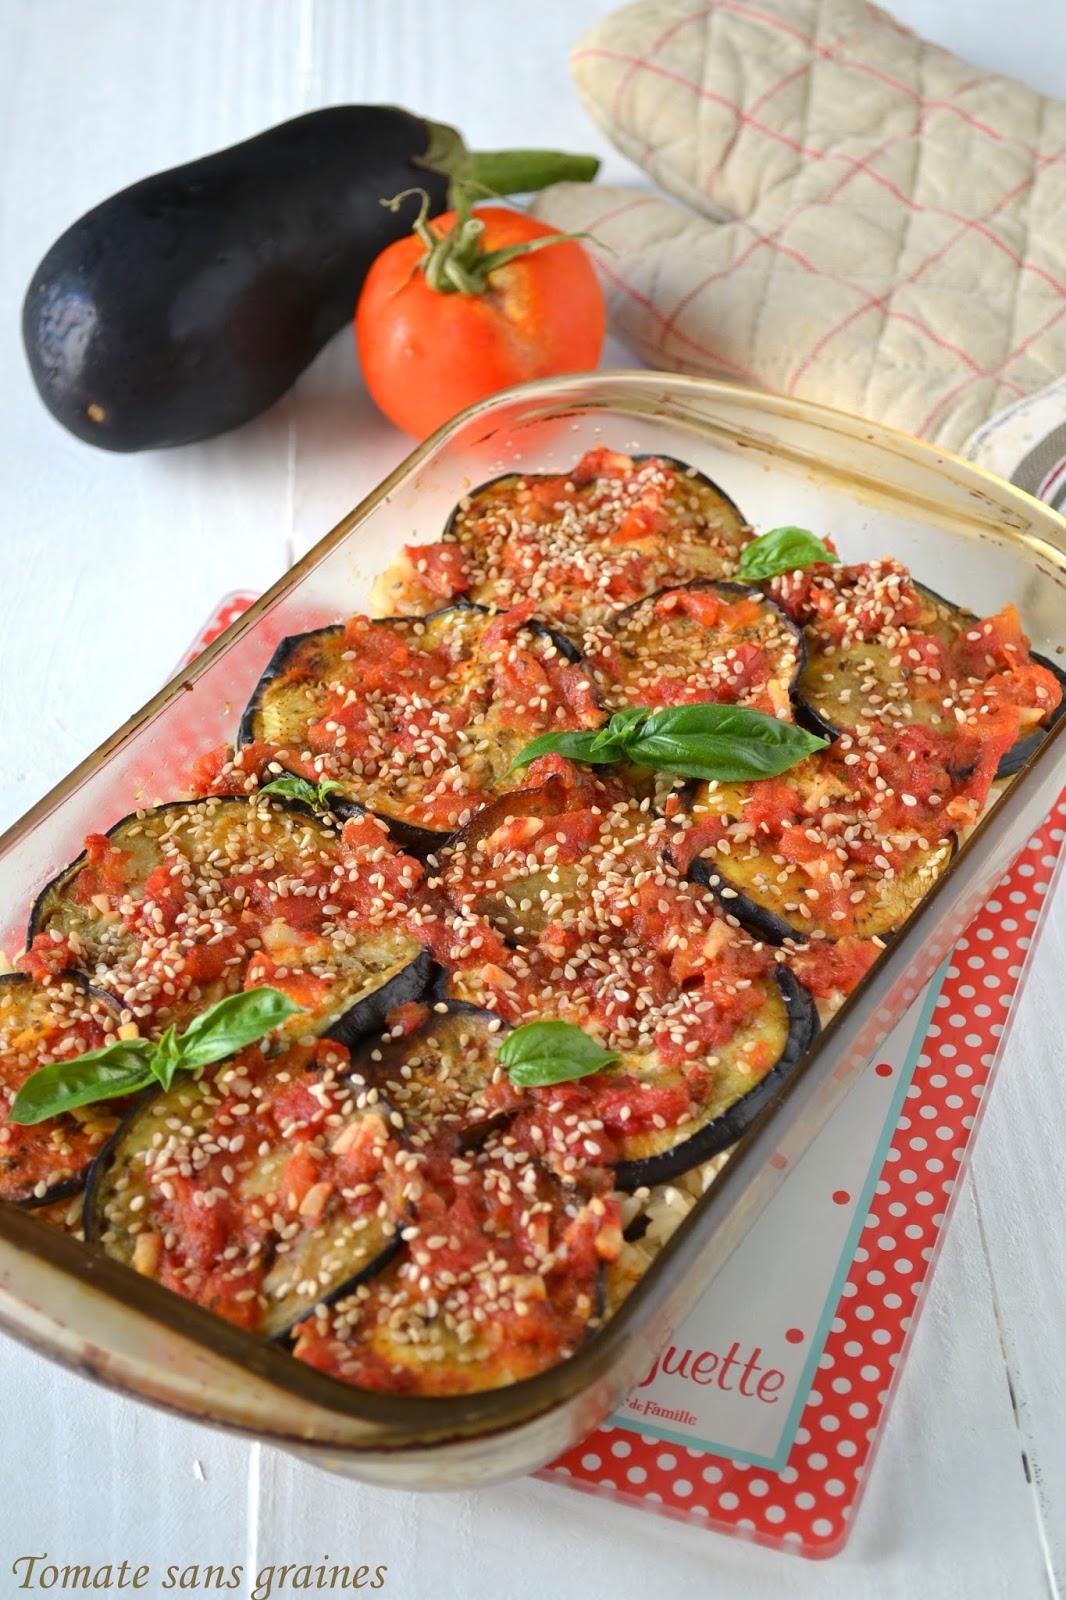 Gratin D'aubergine Sans Tomate : gratin, d'aubergine, tomate, Gratin, D'aubergines, Complet, Tomate, Graines,, Engagé, Stéphanie, Faustin